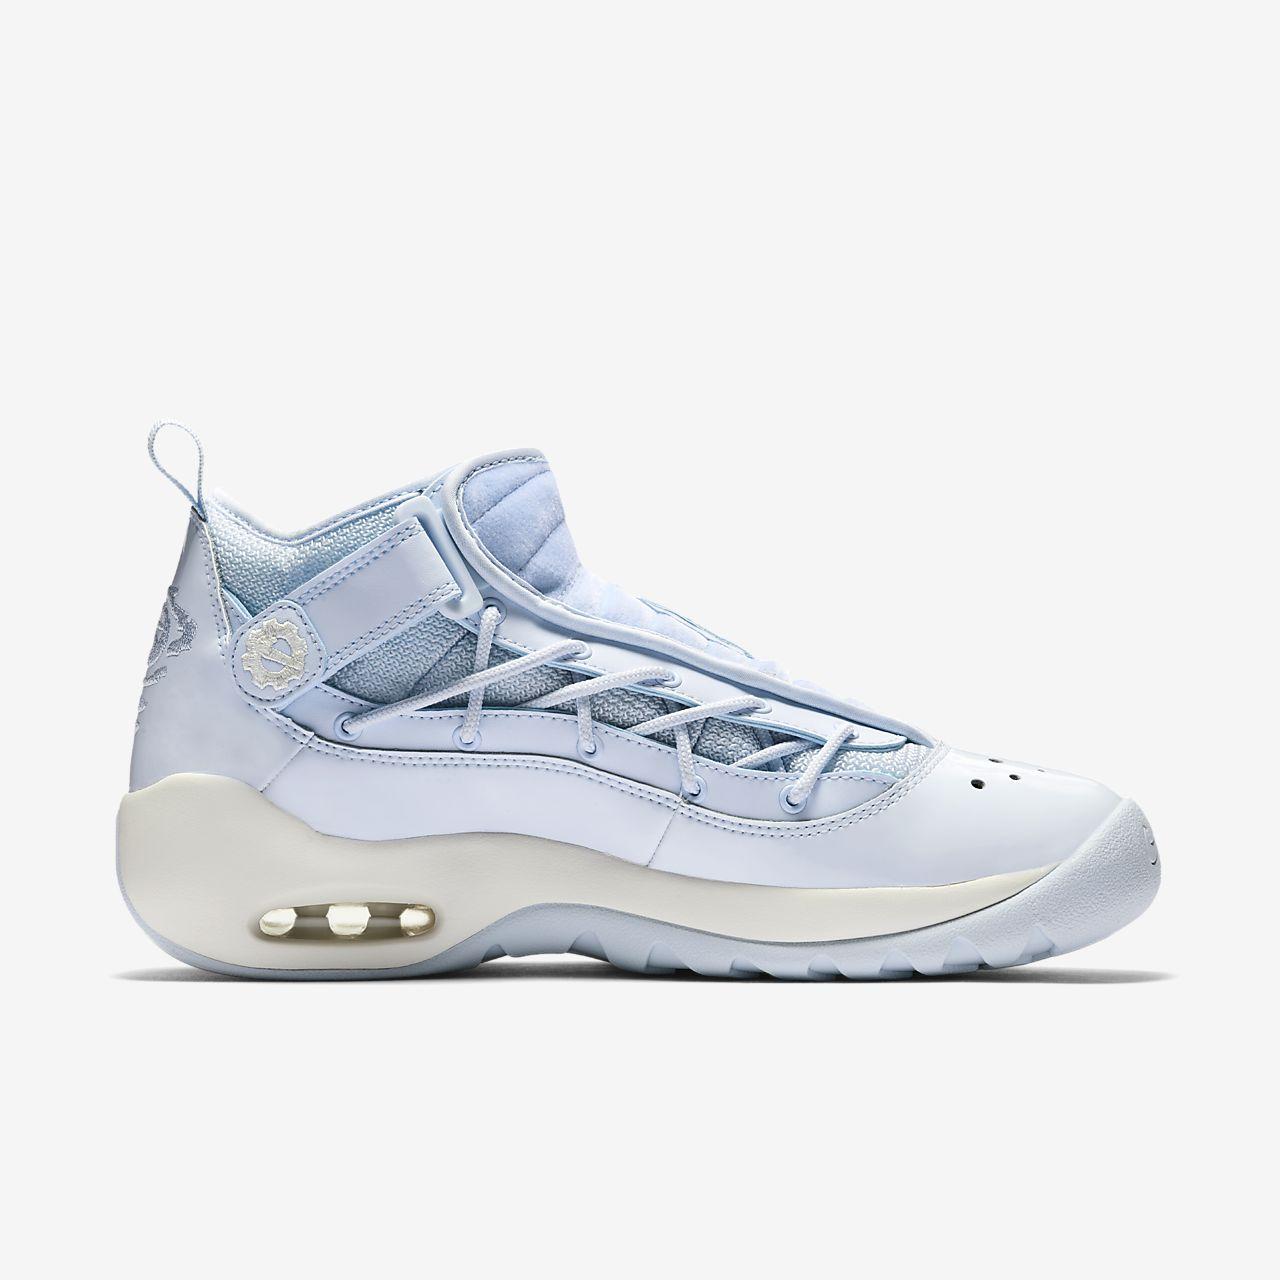 Qs Shake ShoeBe Nike Air Men's Ndestrukt 8nwmN0